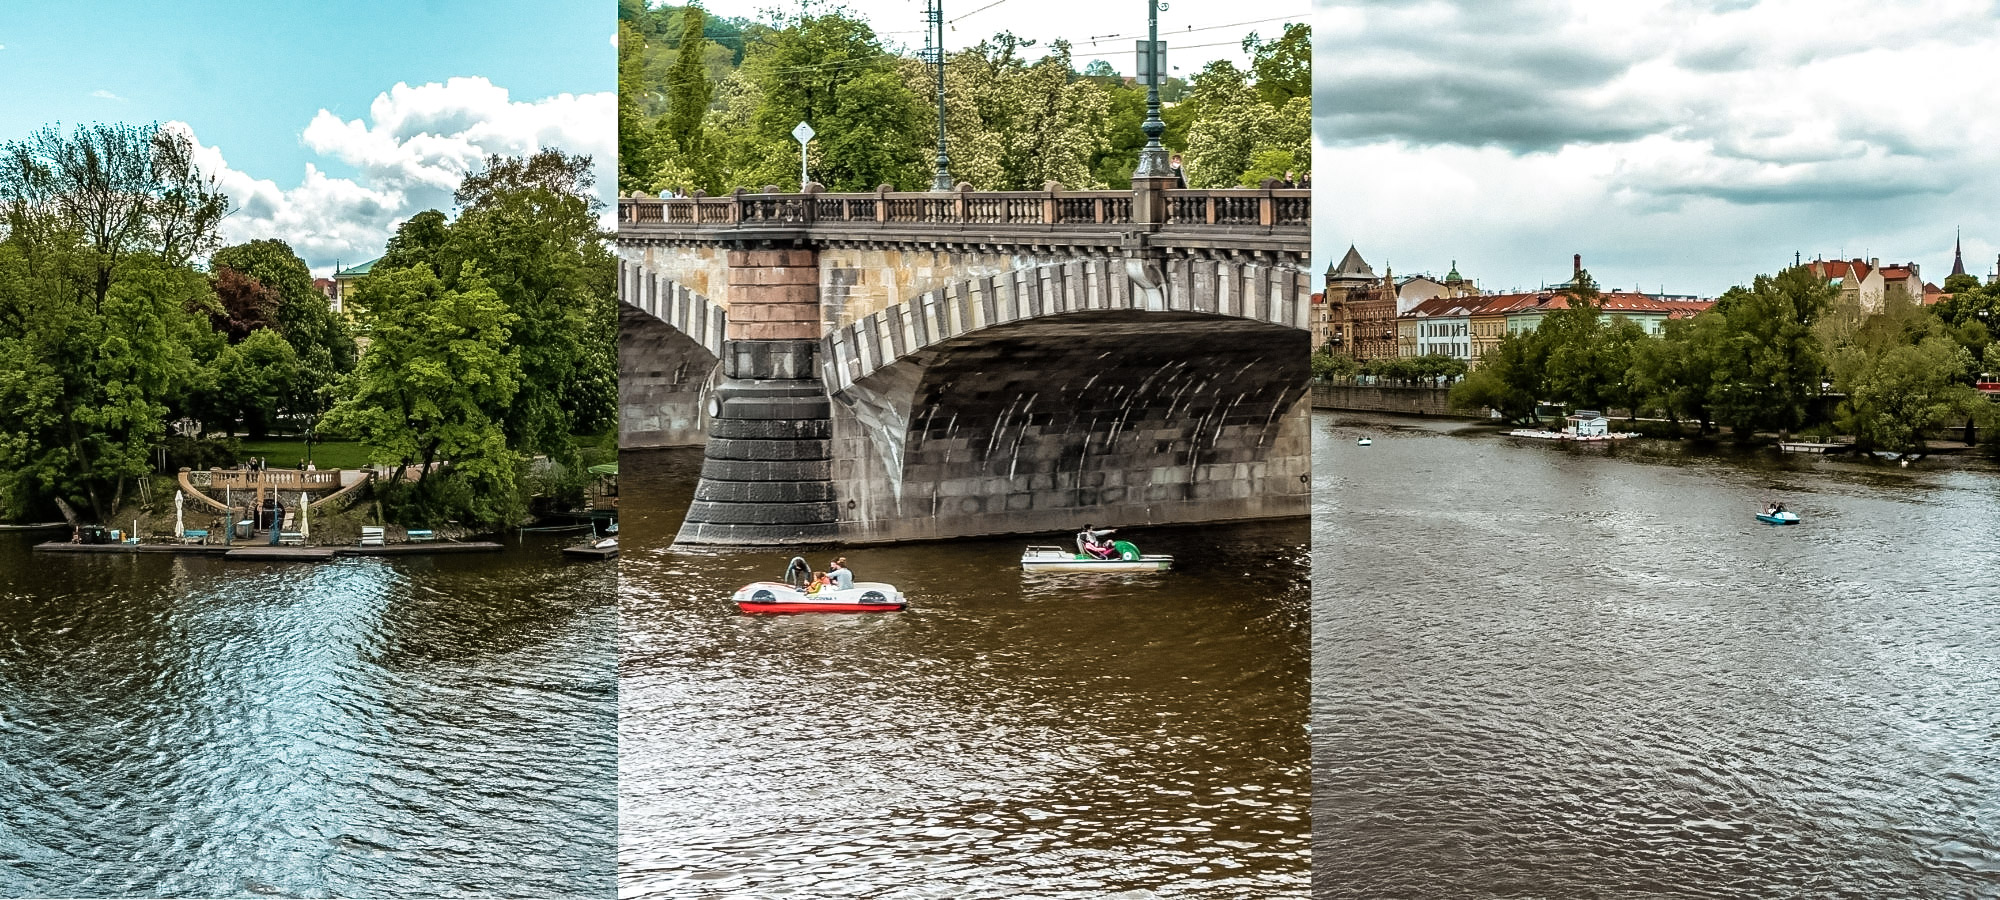 Paddle boats crossing the Vltavariver in Prague, Czech Republic